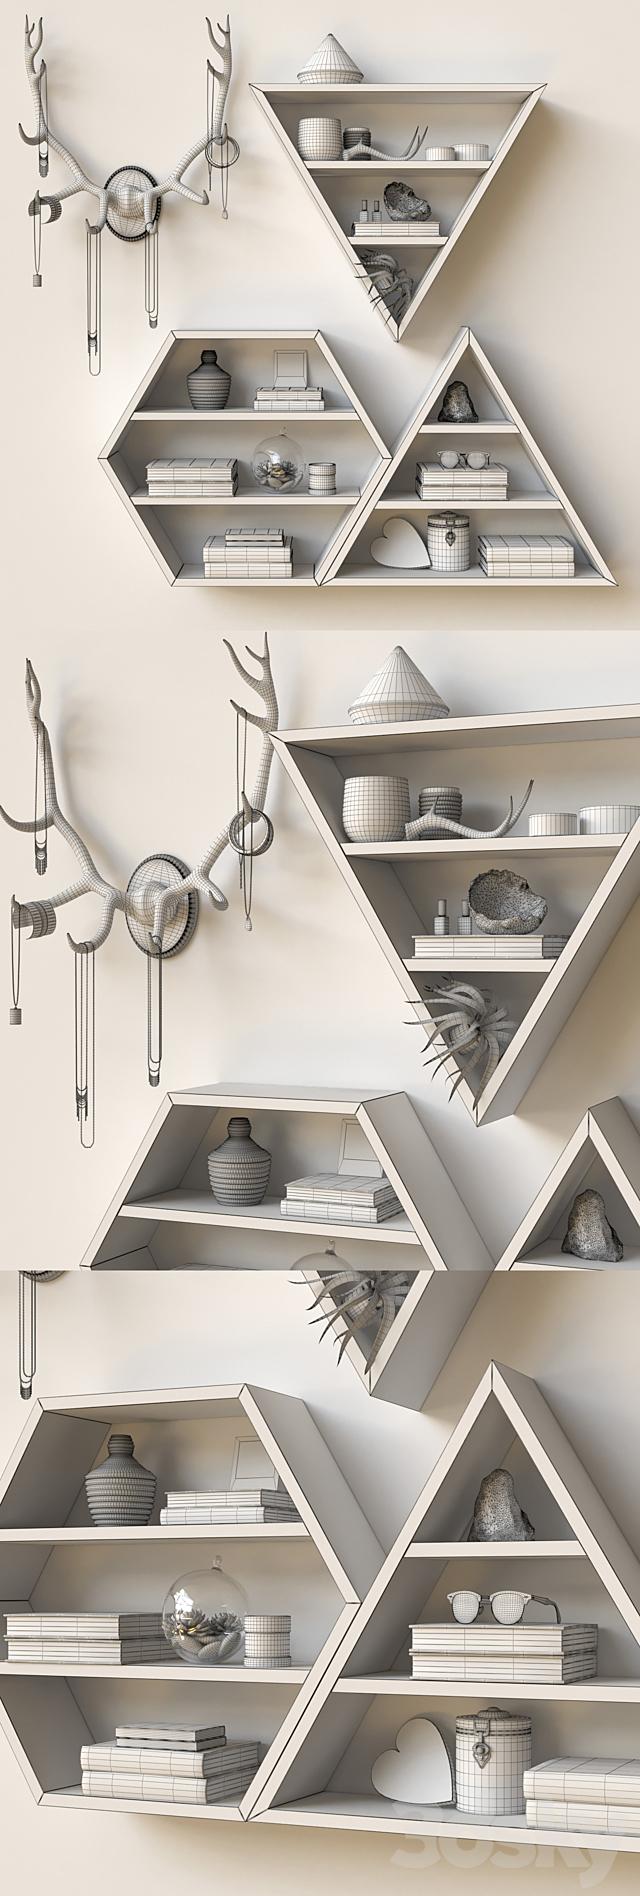 Triangular Shelves